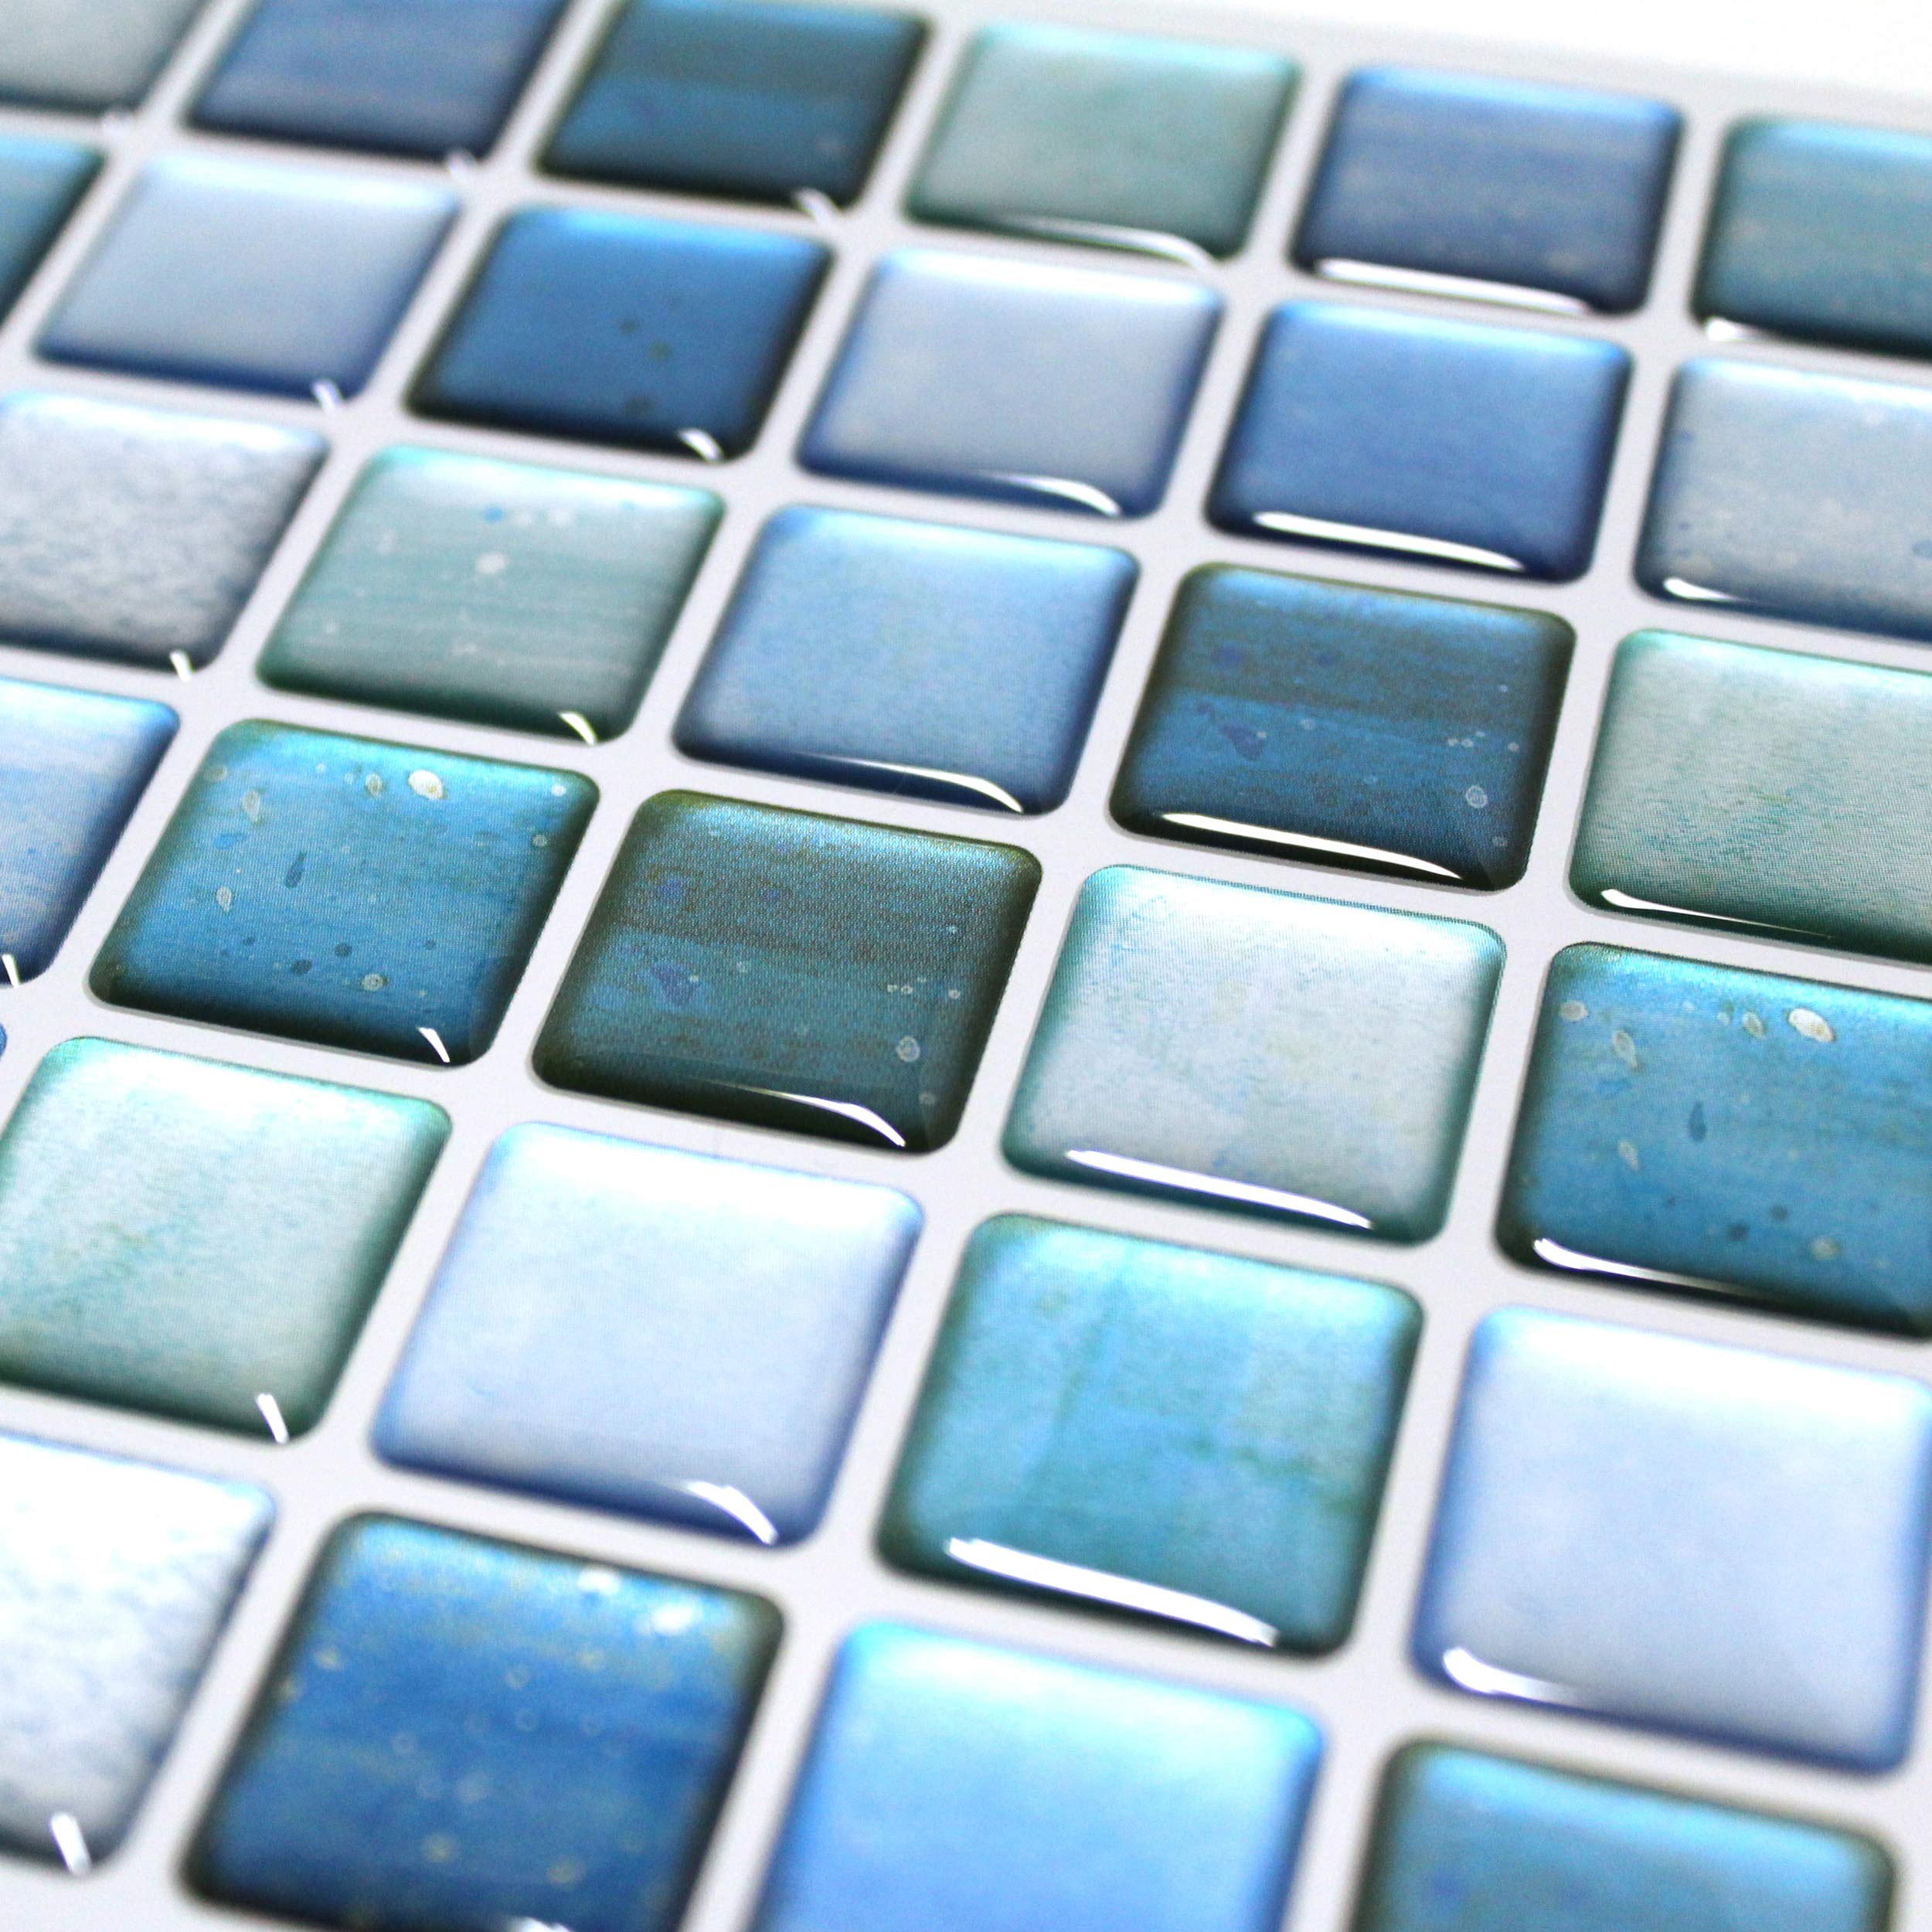 BEAUSTILE Decorative Tile Stickers Peel and Stick Backsplash Fire Retardant Tile Sheet (N.Blue) (10, 5.28'' x 14.8'') by BEAUS TILE (Image #3)